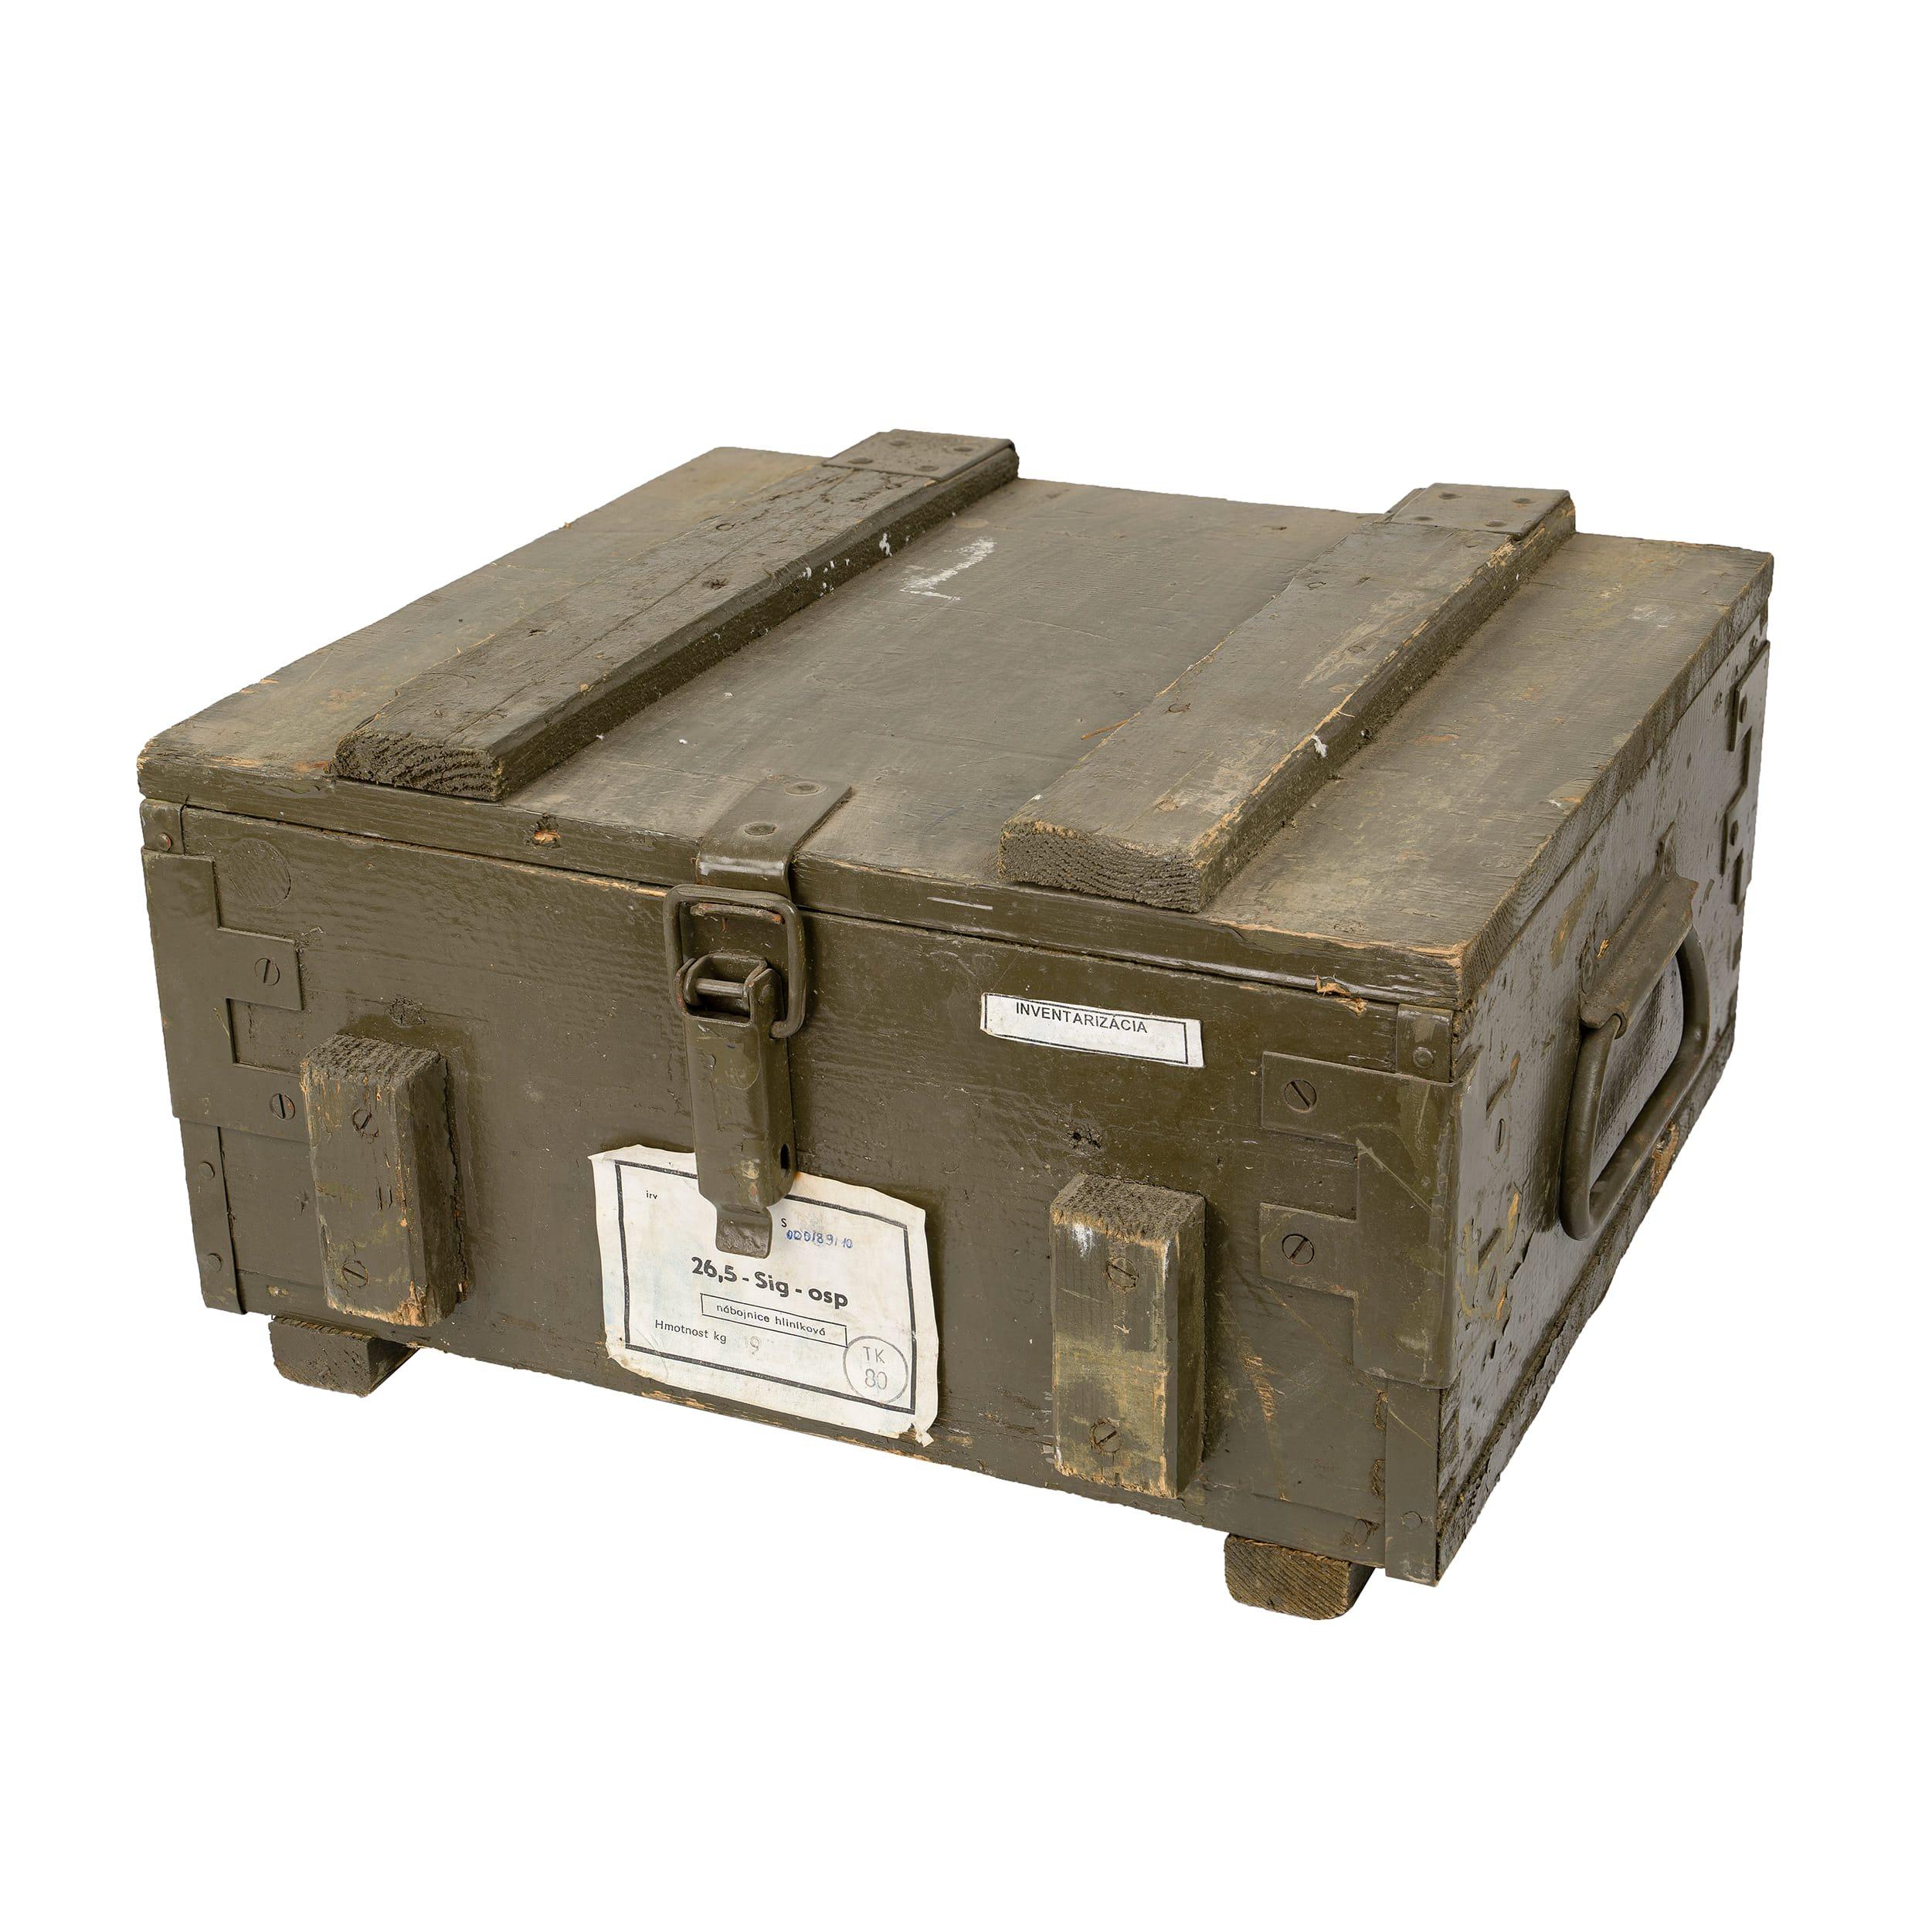 Bedna døevìná od nábojnic Sig 40x40x22 cm použitá